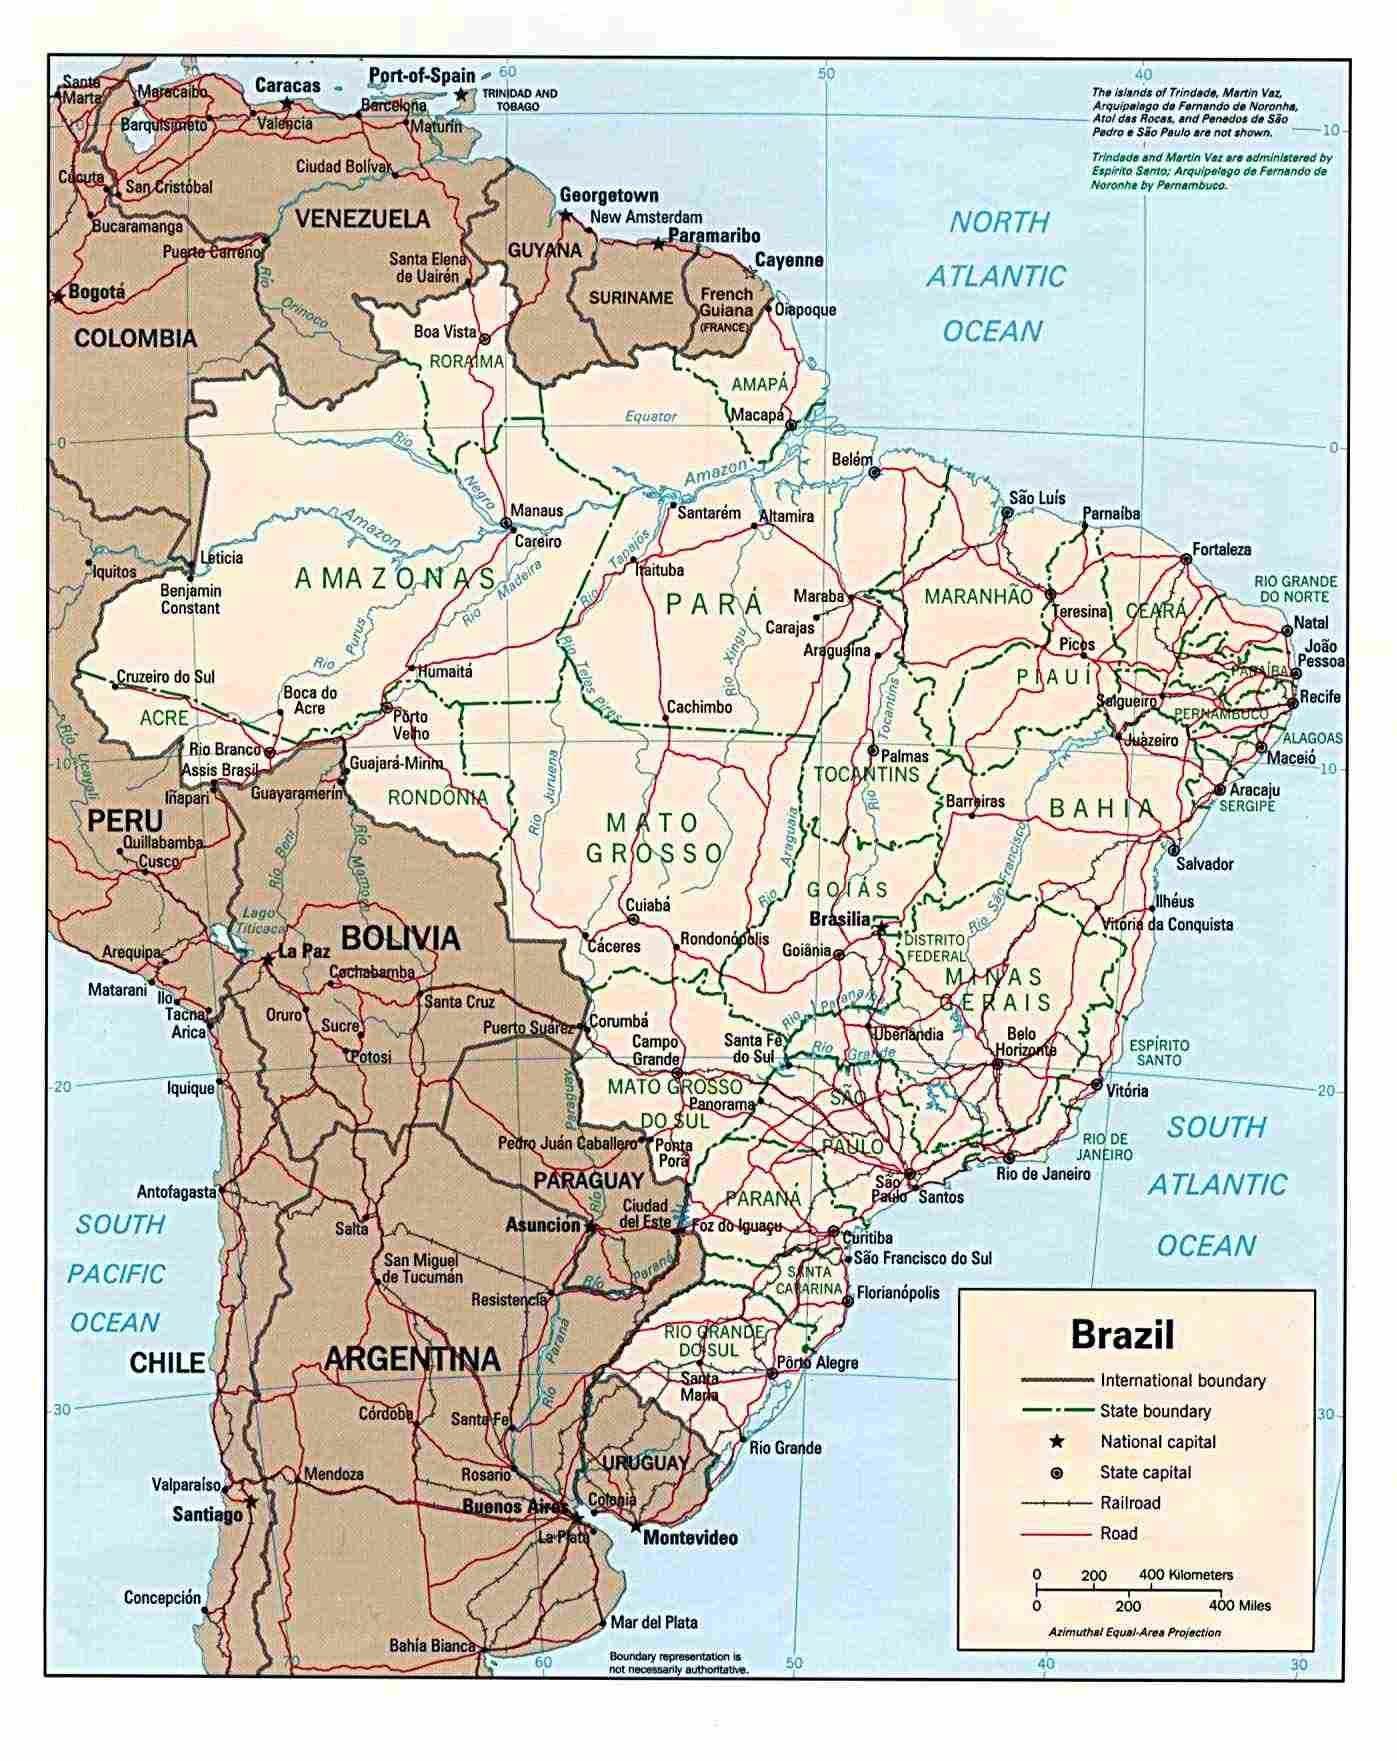 Brazil Maps | Printable Maps Of Brazil For Download - Free Printable Map Of Brazil